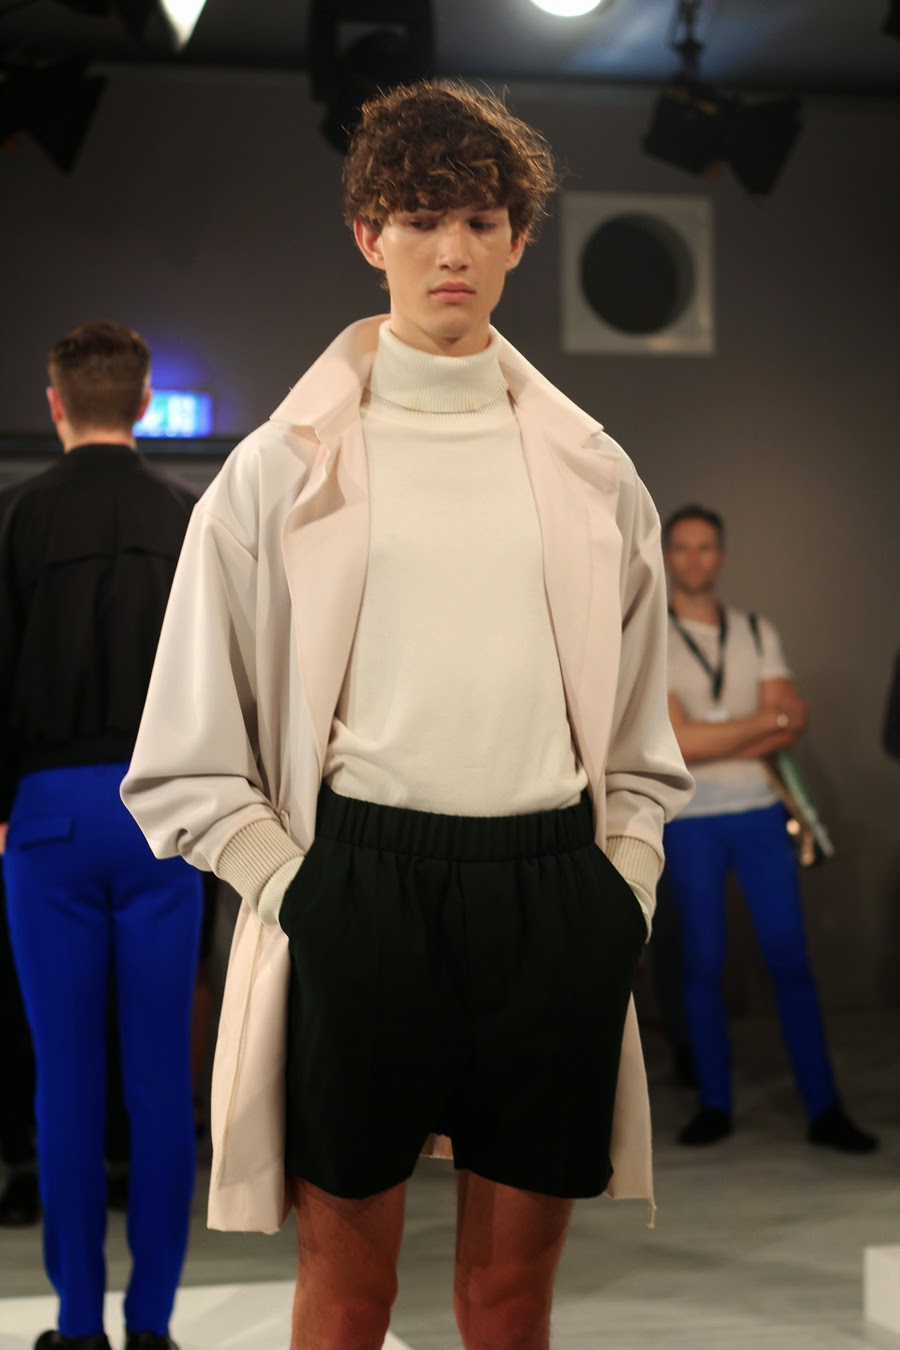 ivan man mercedes benz fashion week  outfit